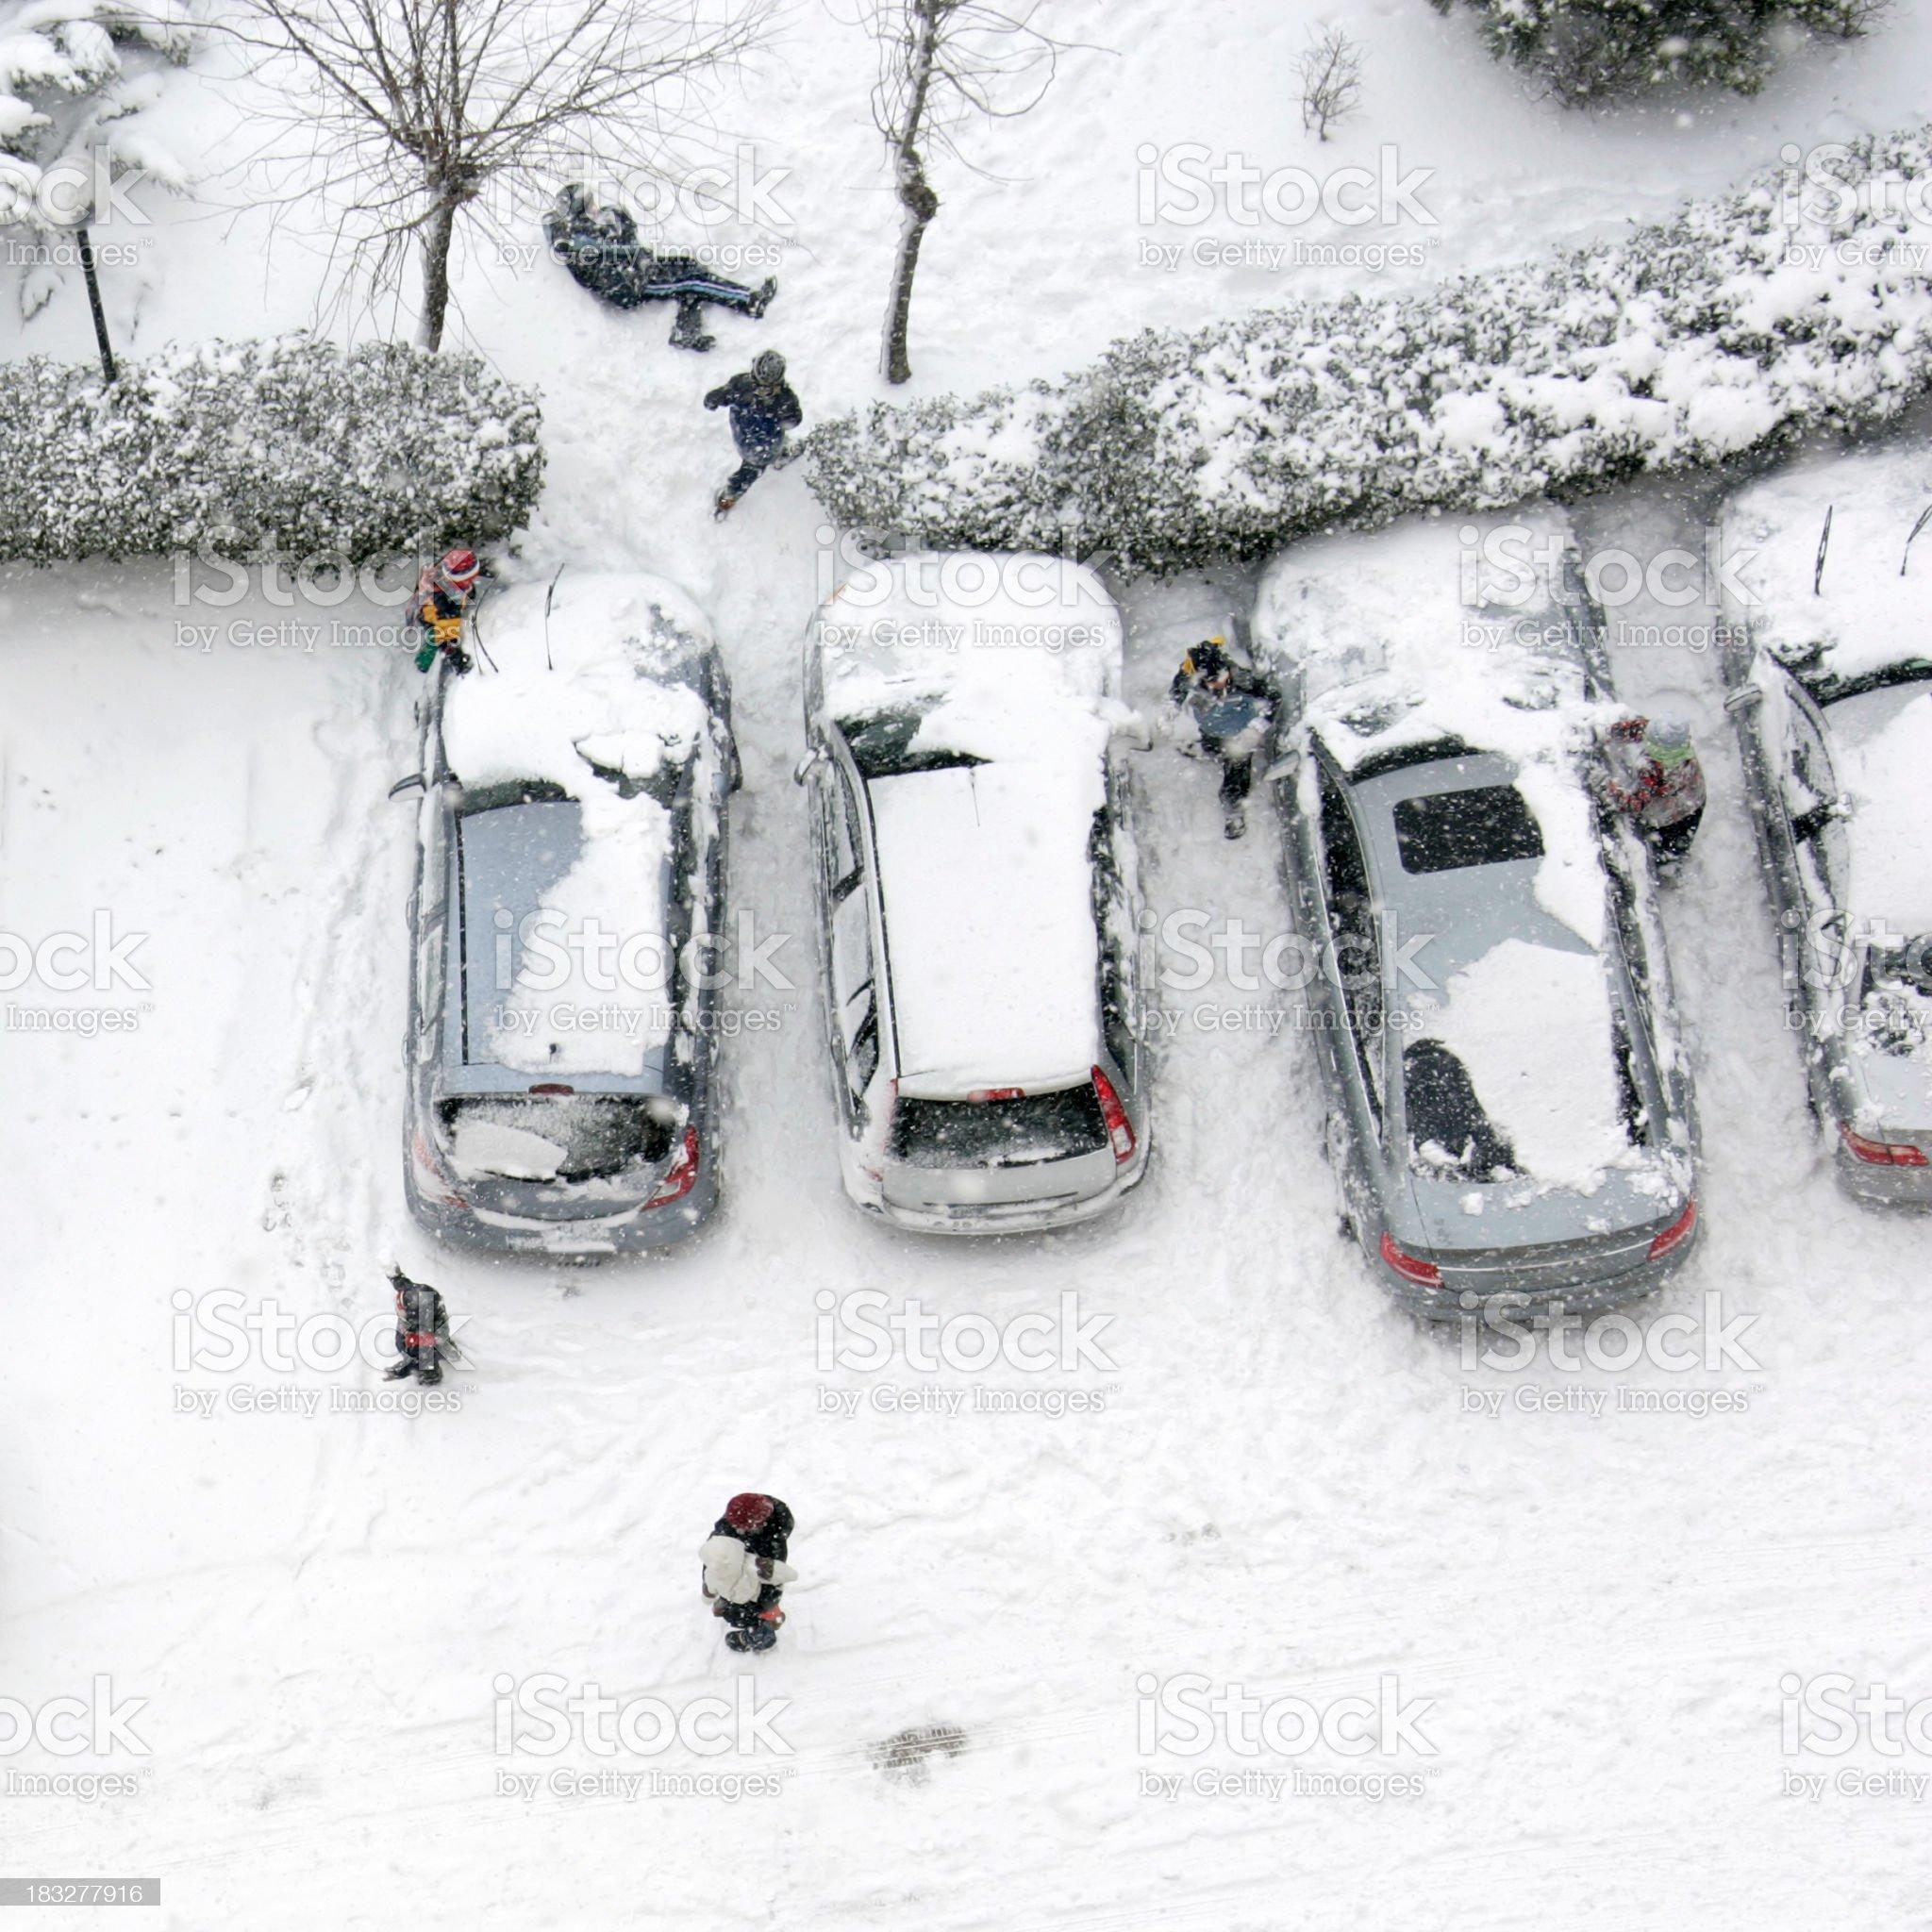 fun in snow royalty-free stock photo